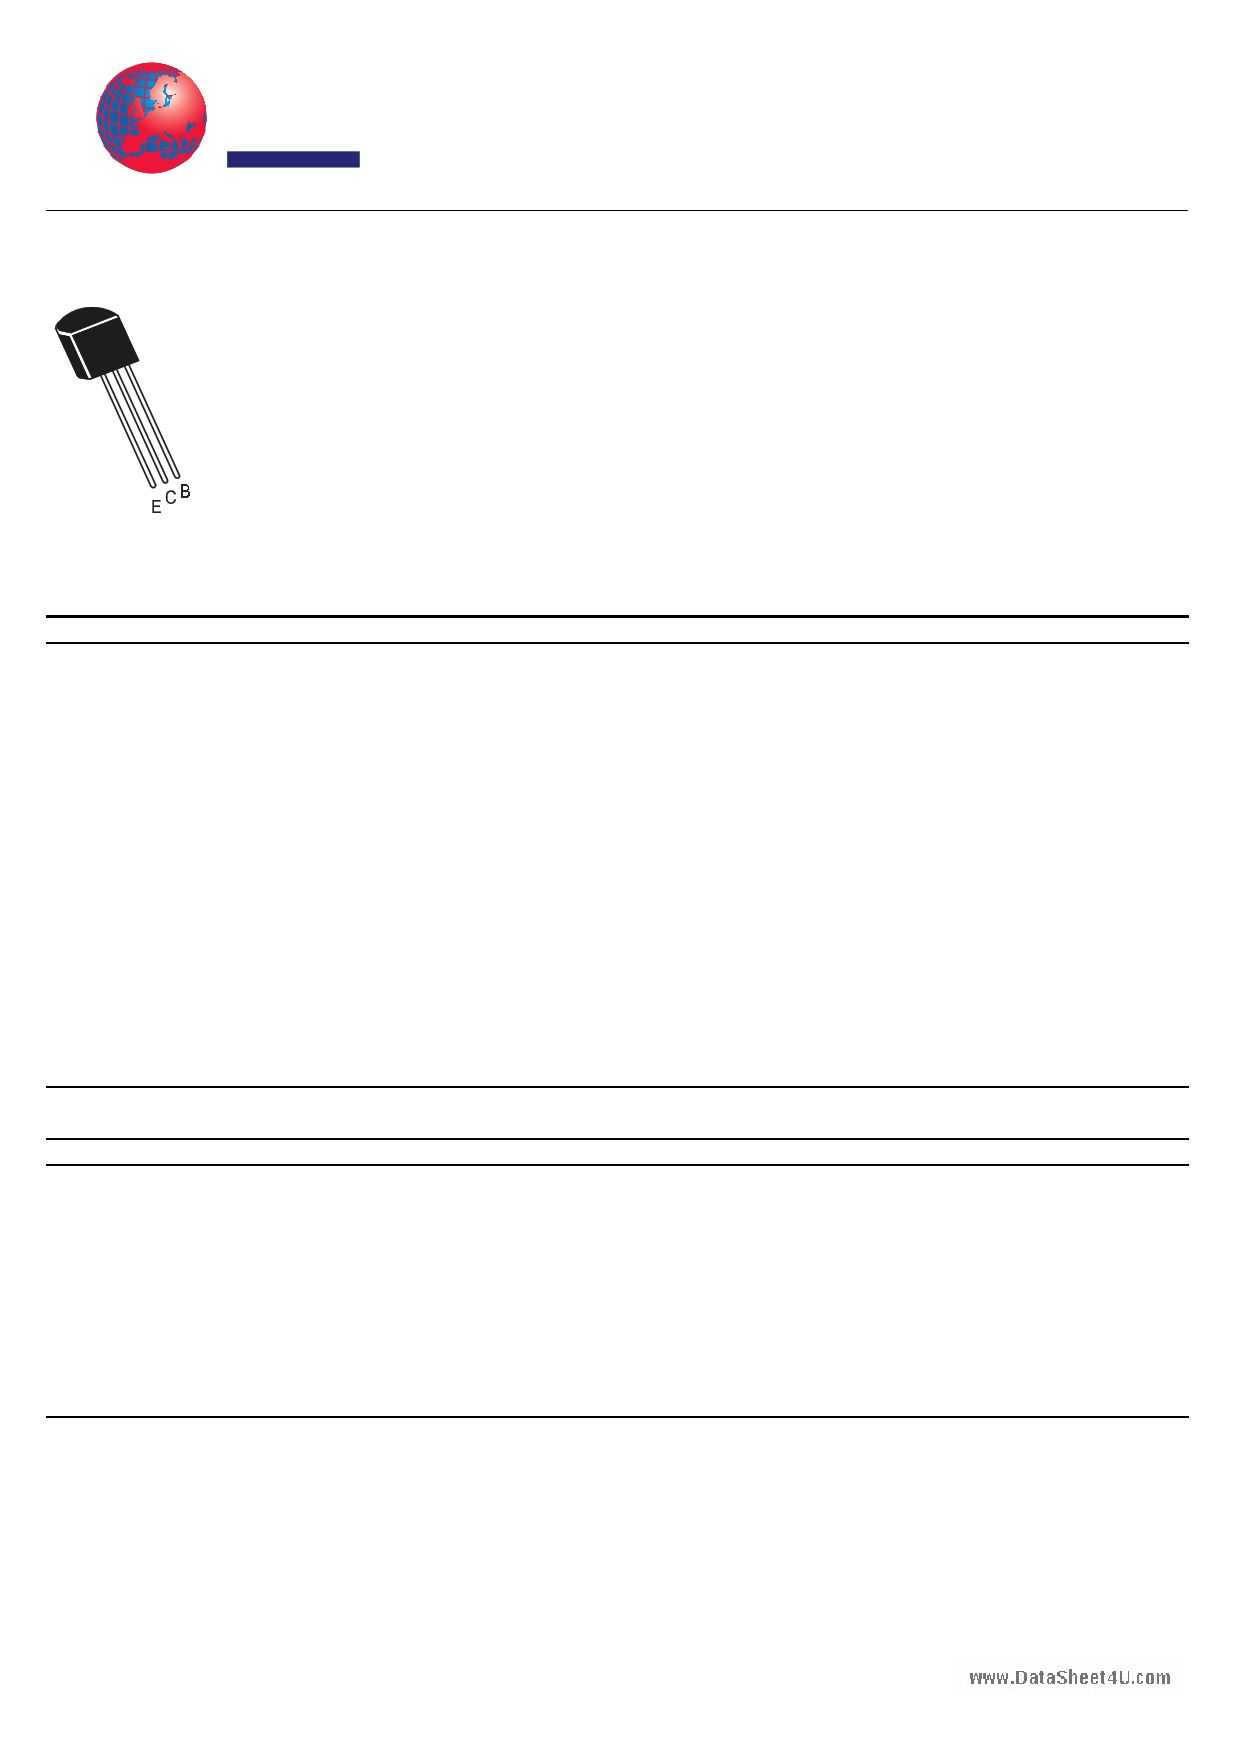 BF422 دیتاشیت PDF